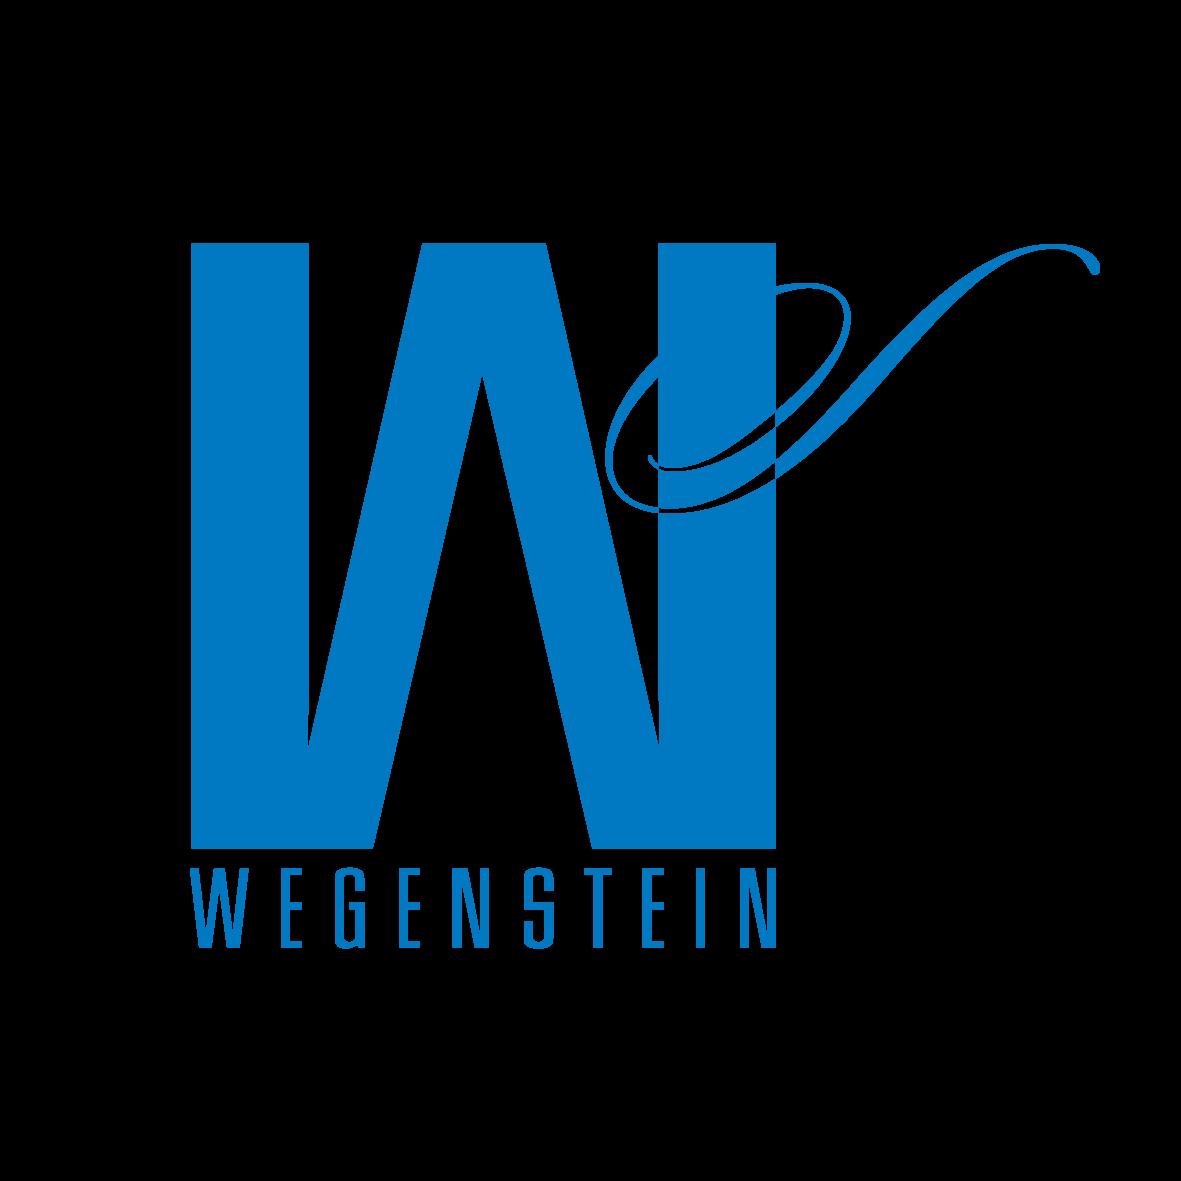 Wegenstein